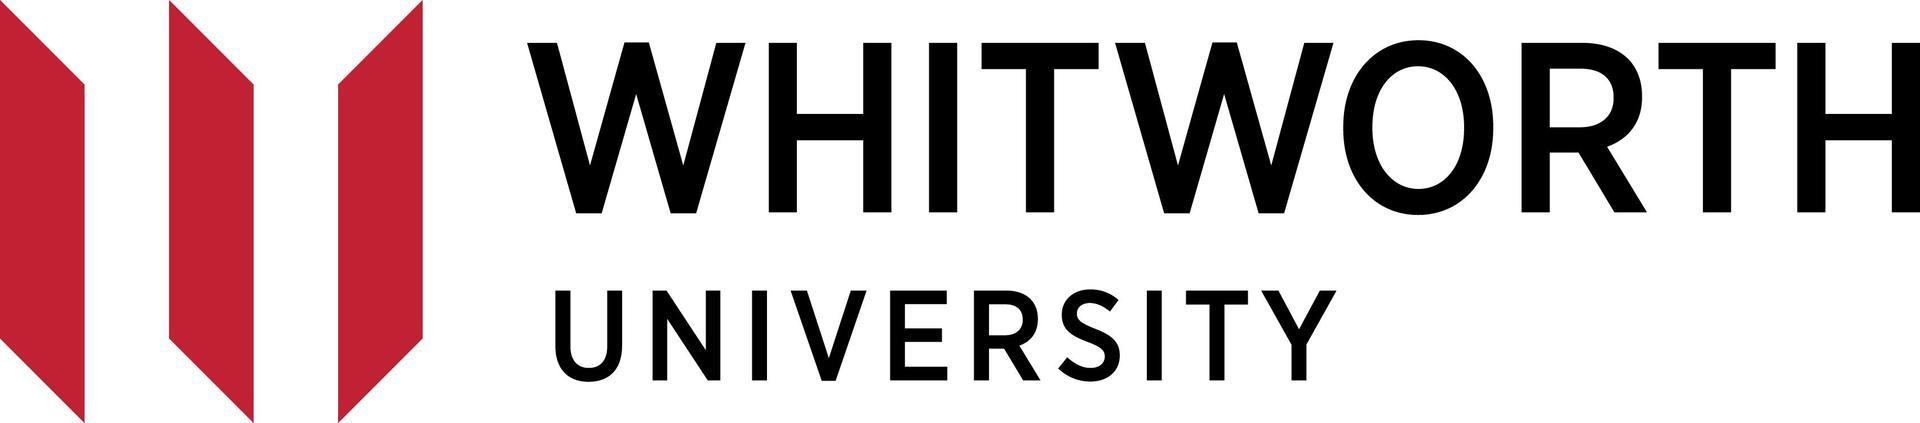 whitworth logo